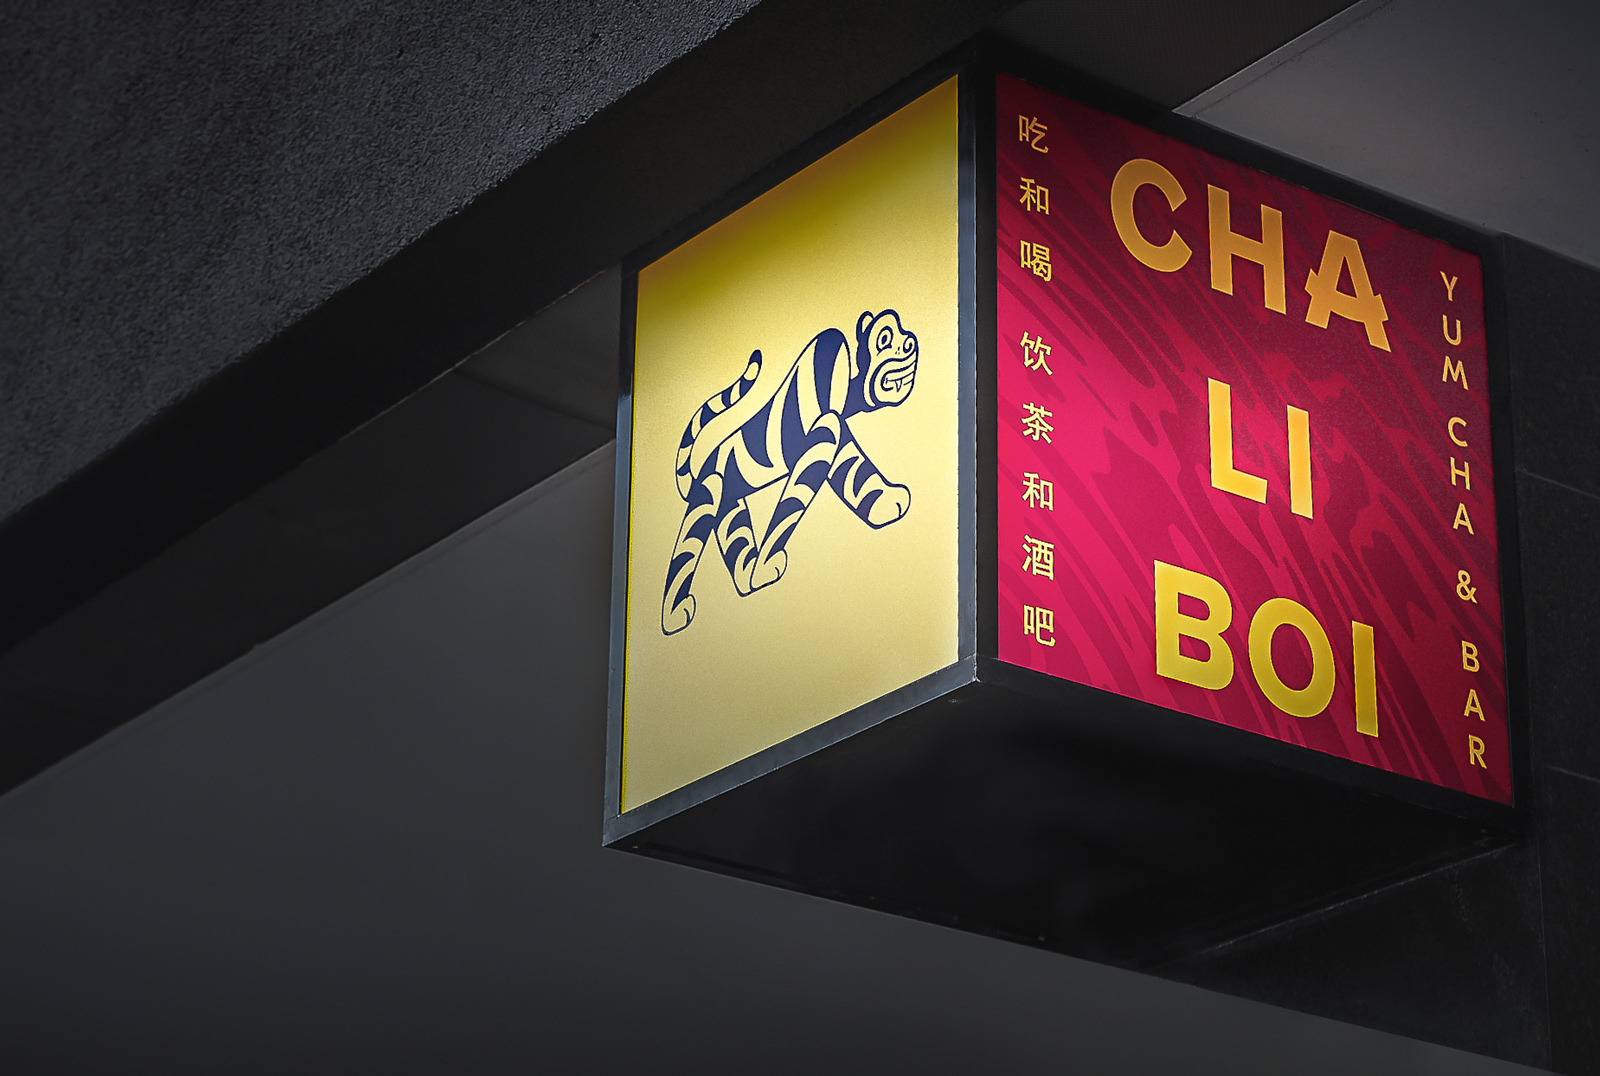 Cha Li Boi yum cha and bar restaurant branding and design